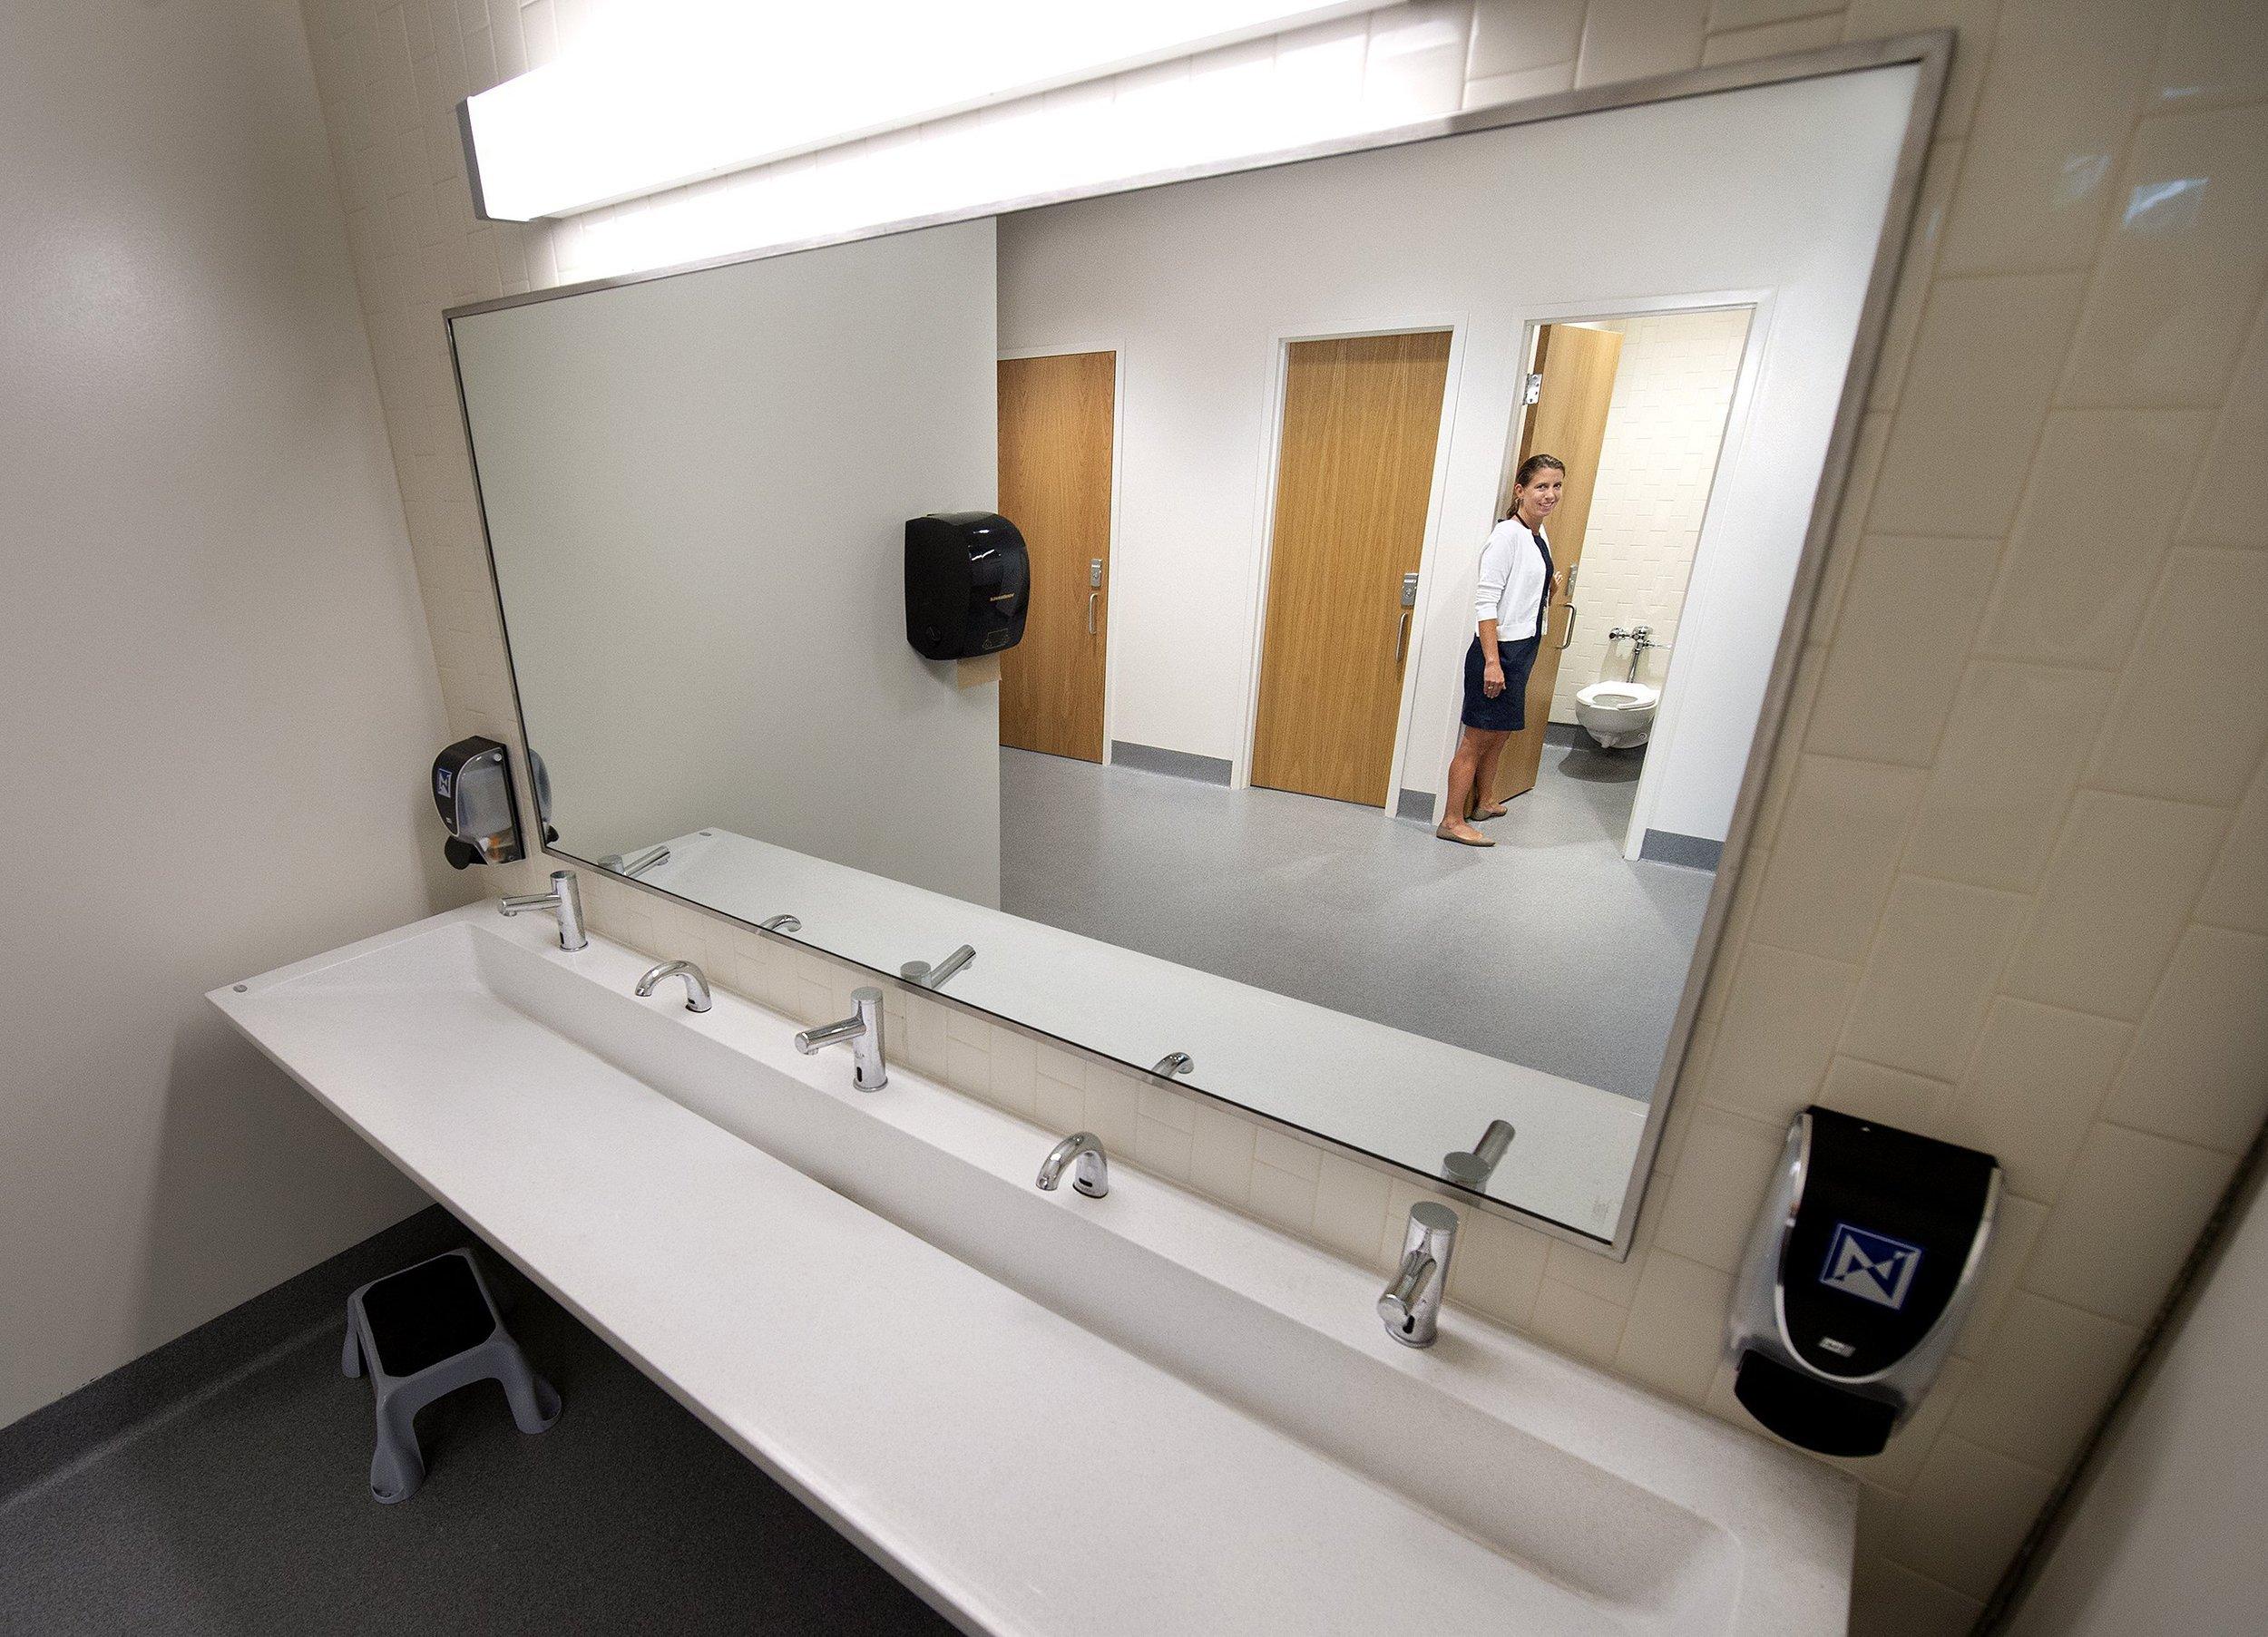 Missouri School District Embraces Gender Neutral Bathrooms